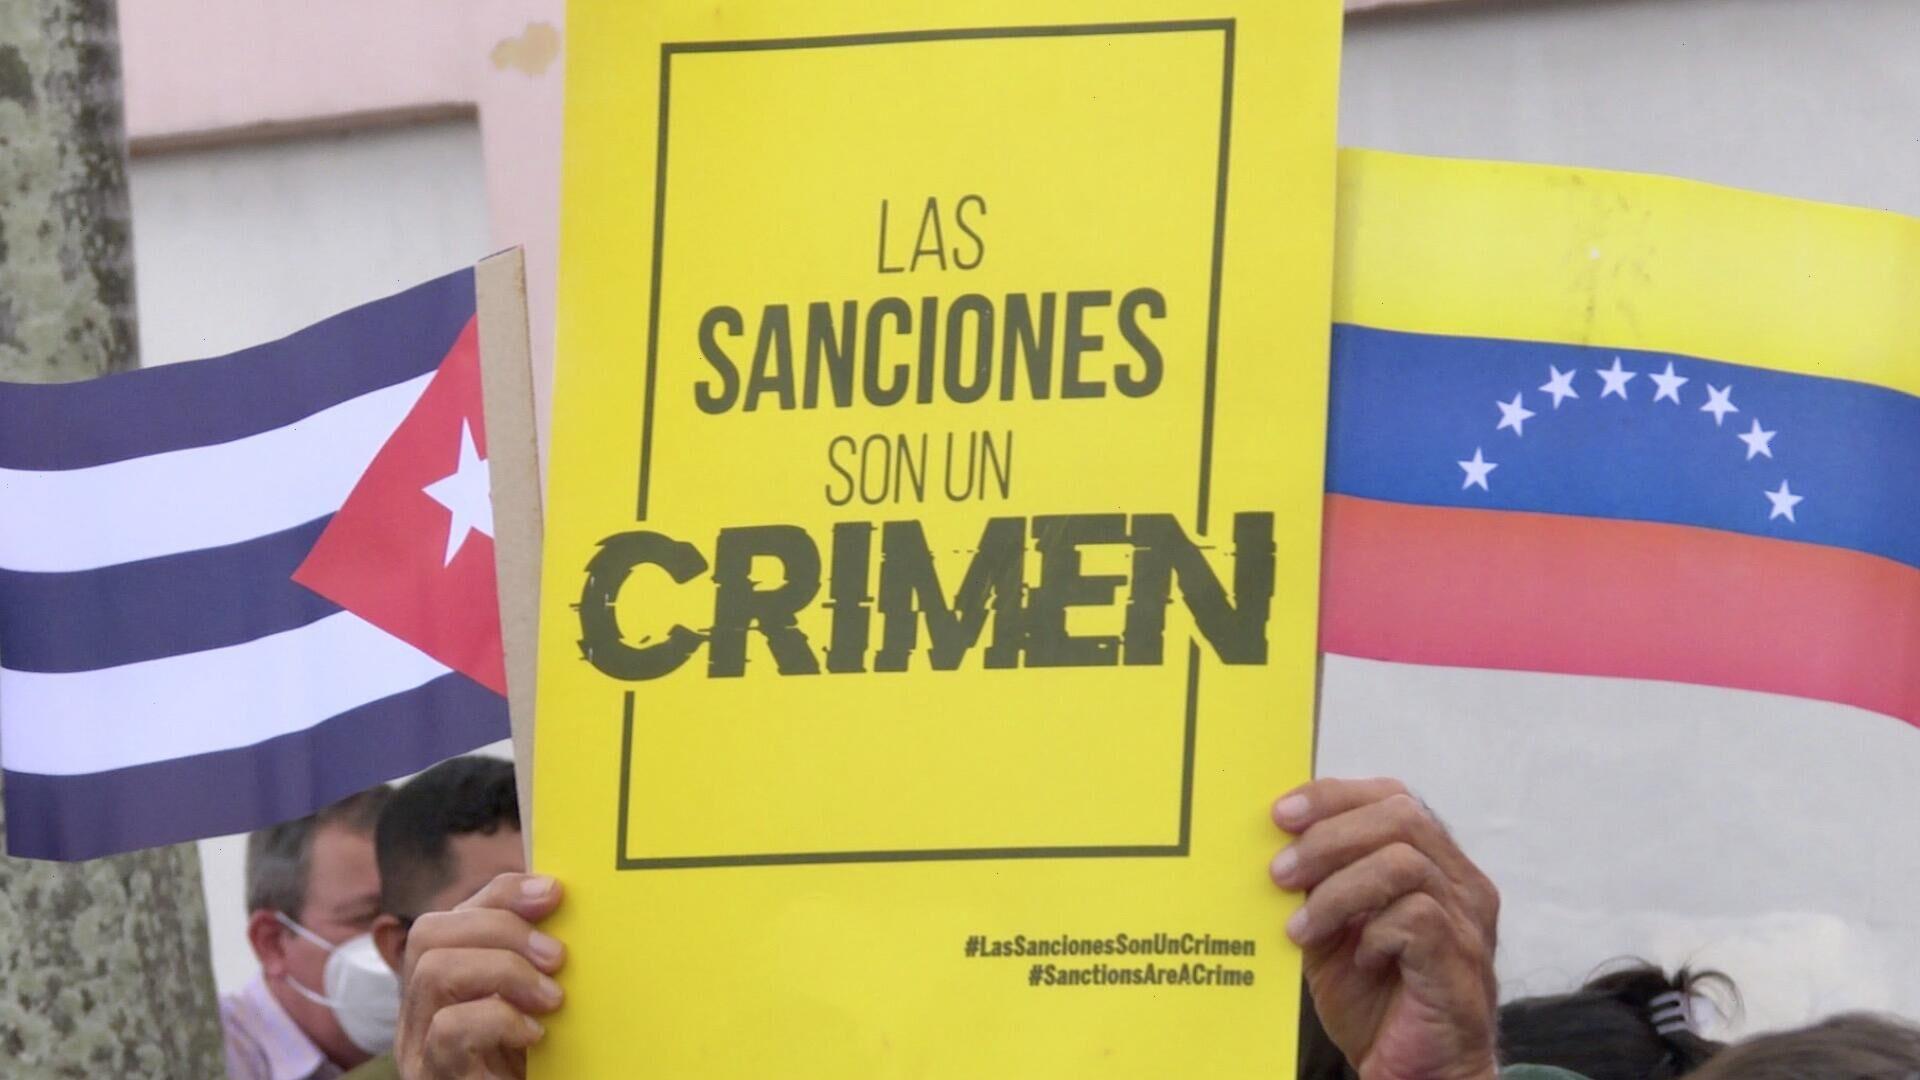 Aplican a Cuba la misma receta que a Venezuela y Nicaragua, denuncian militantes venezolanos - Sputnik Mundo, 1920, 12.07.2021